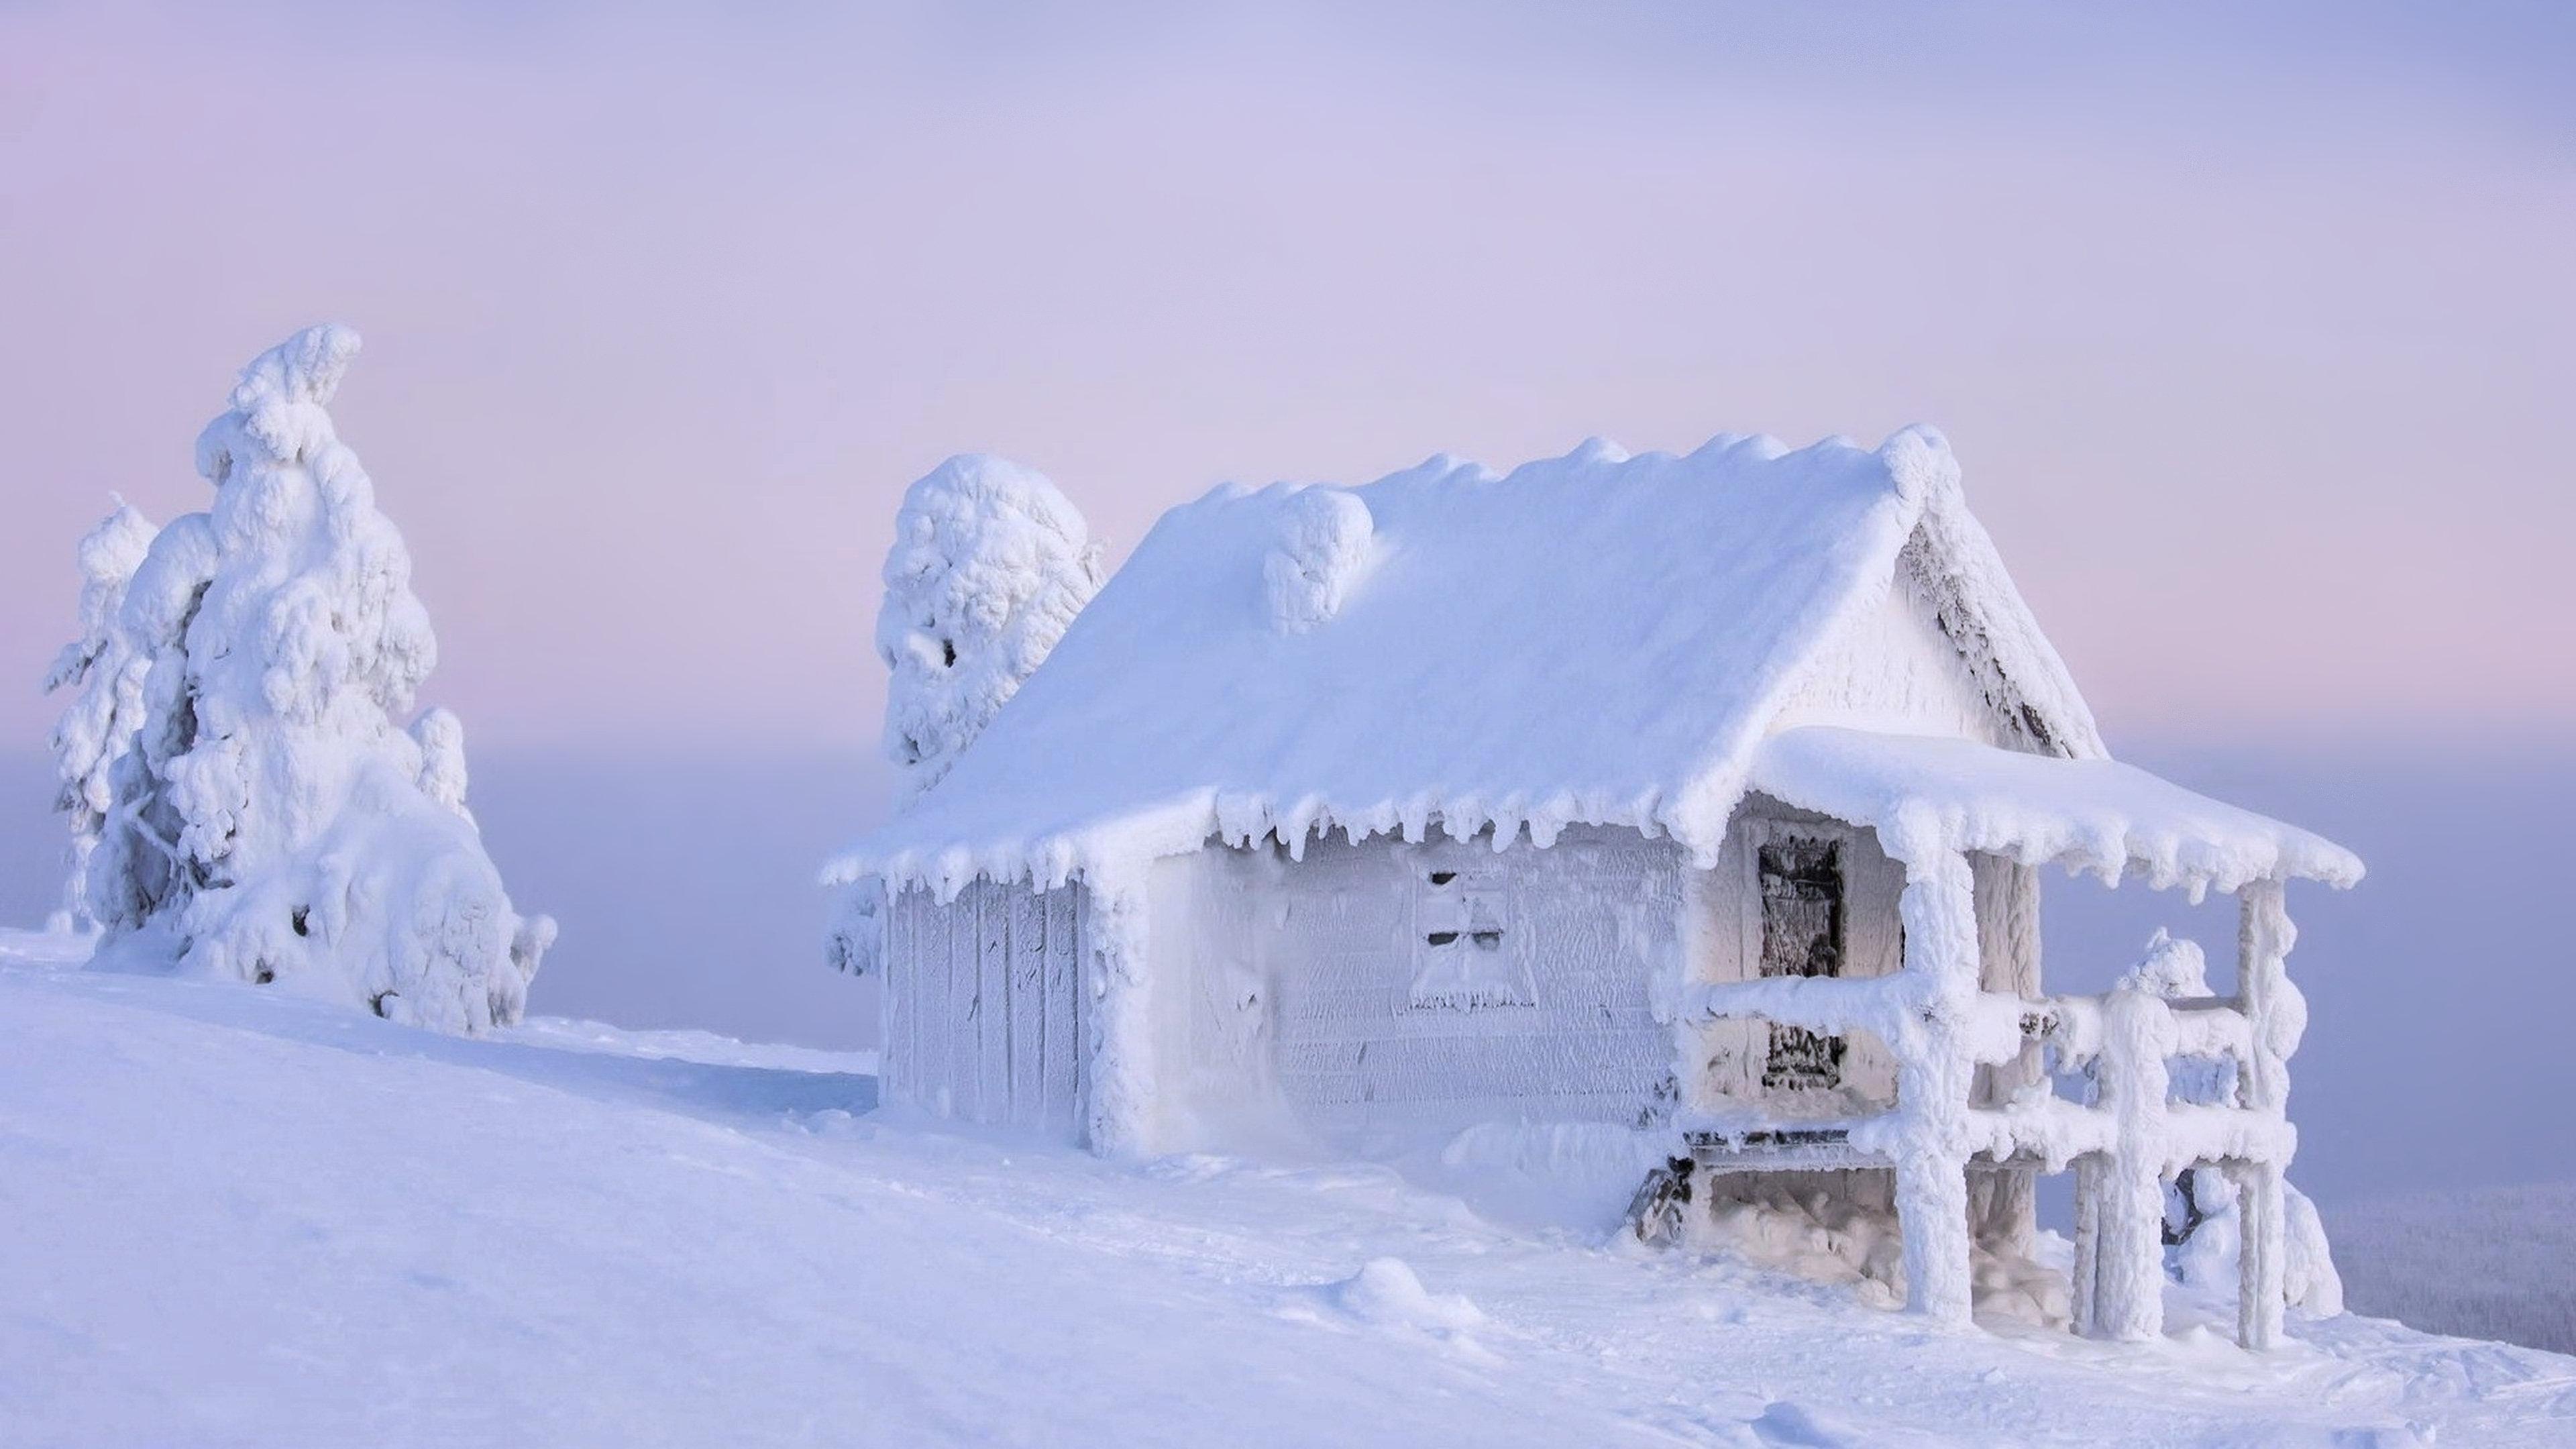 1600x900 hd desktop wallpaper winter - photo #29